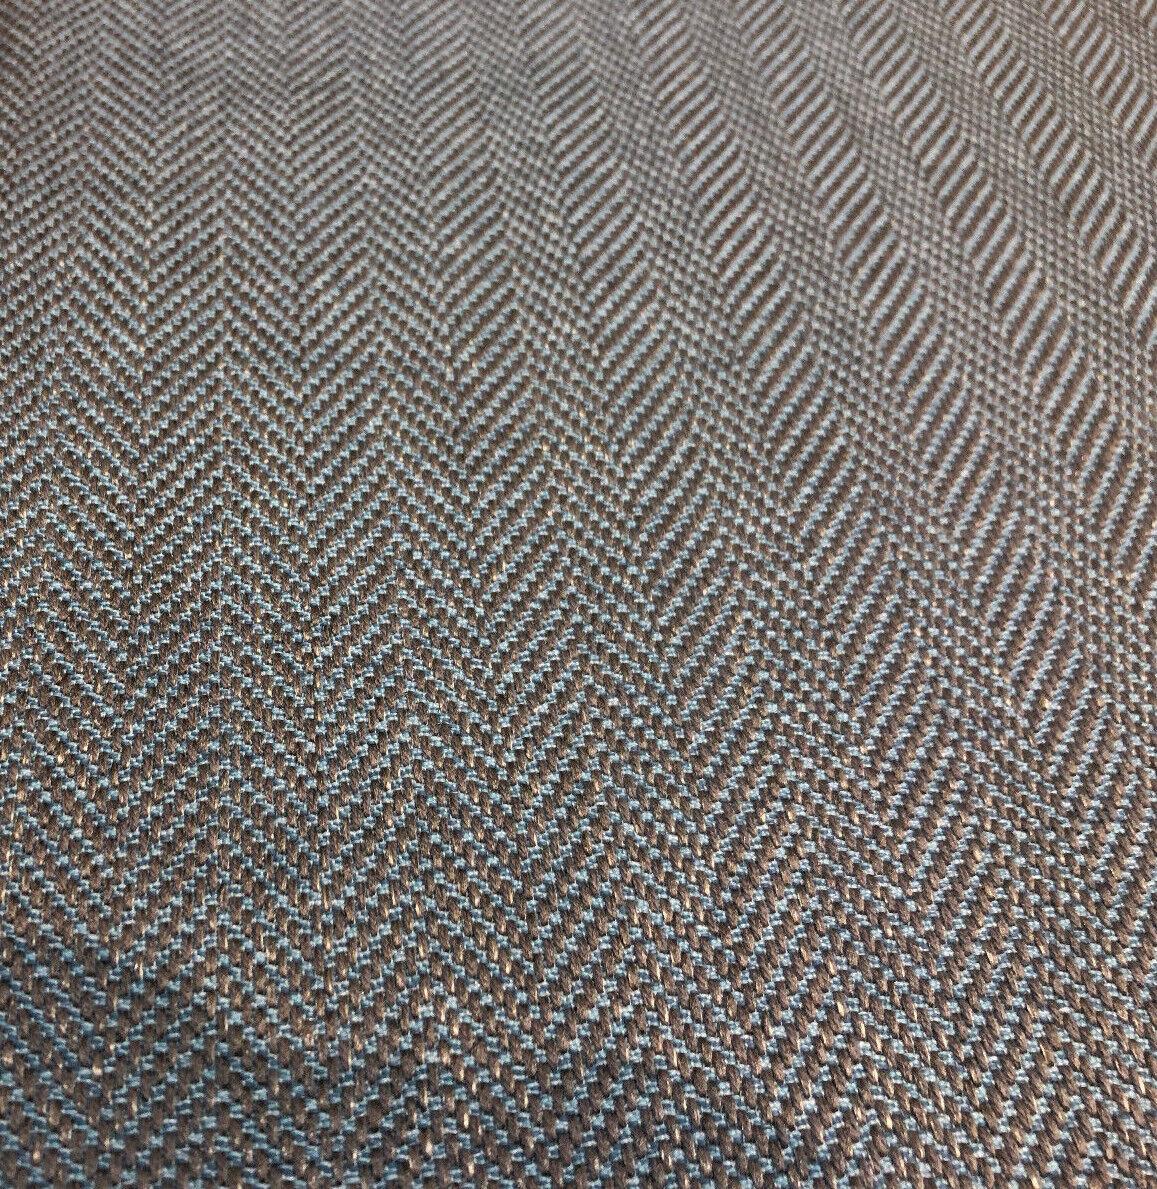 Fabricut Micheal Aqua Blue Herringbone Upholstery Fabric by